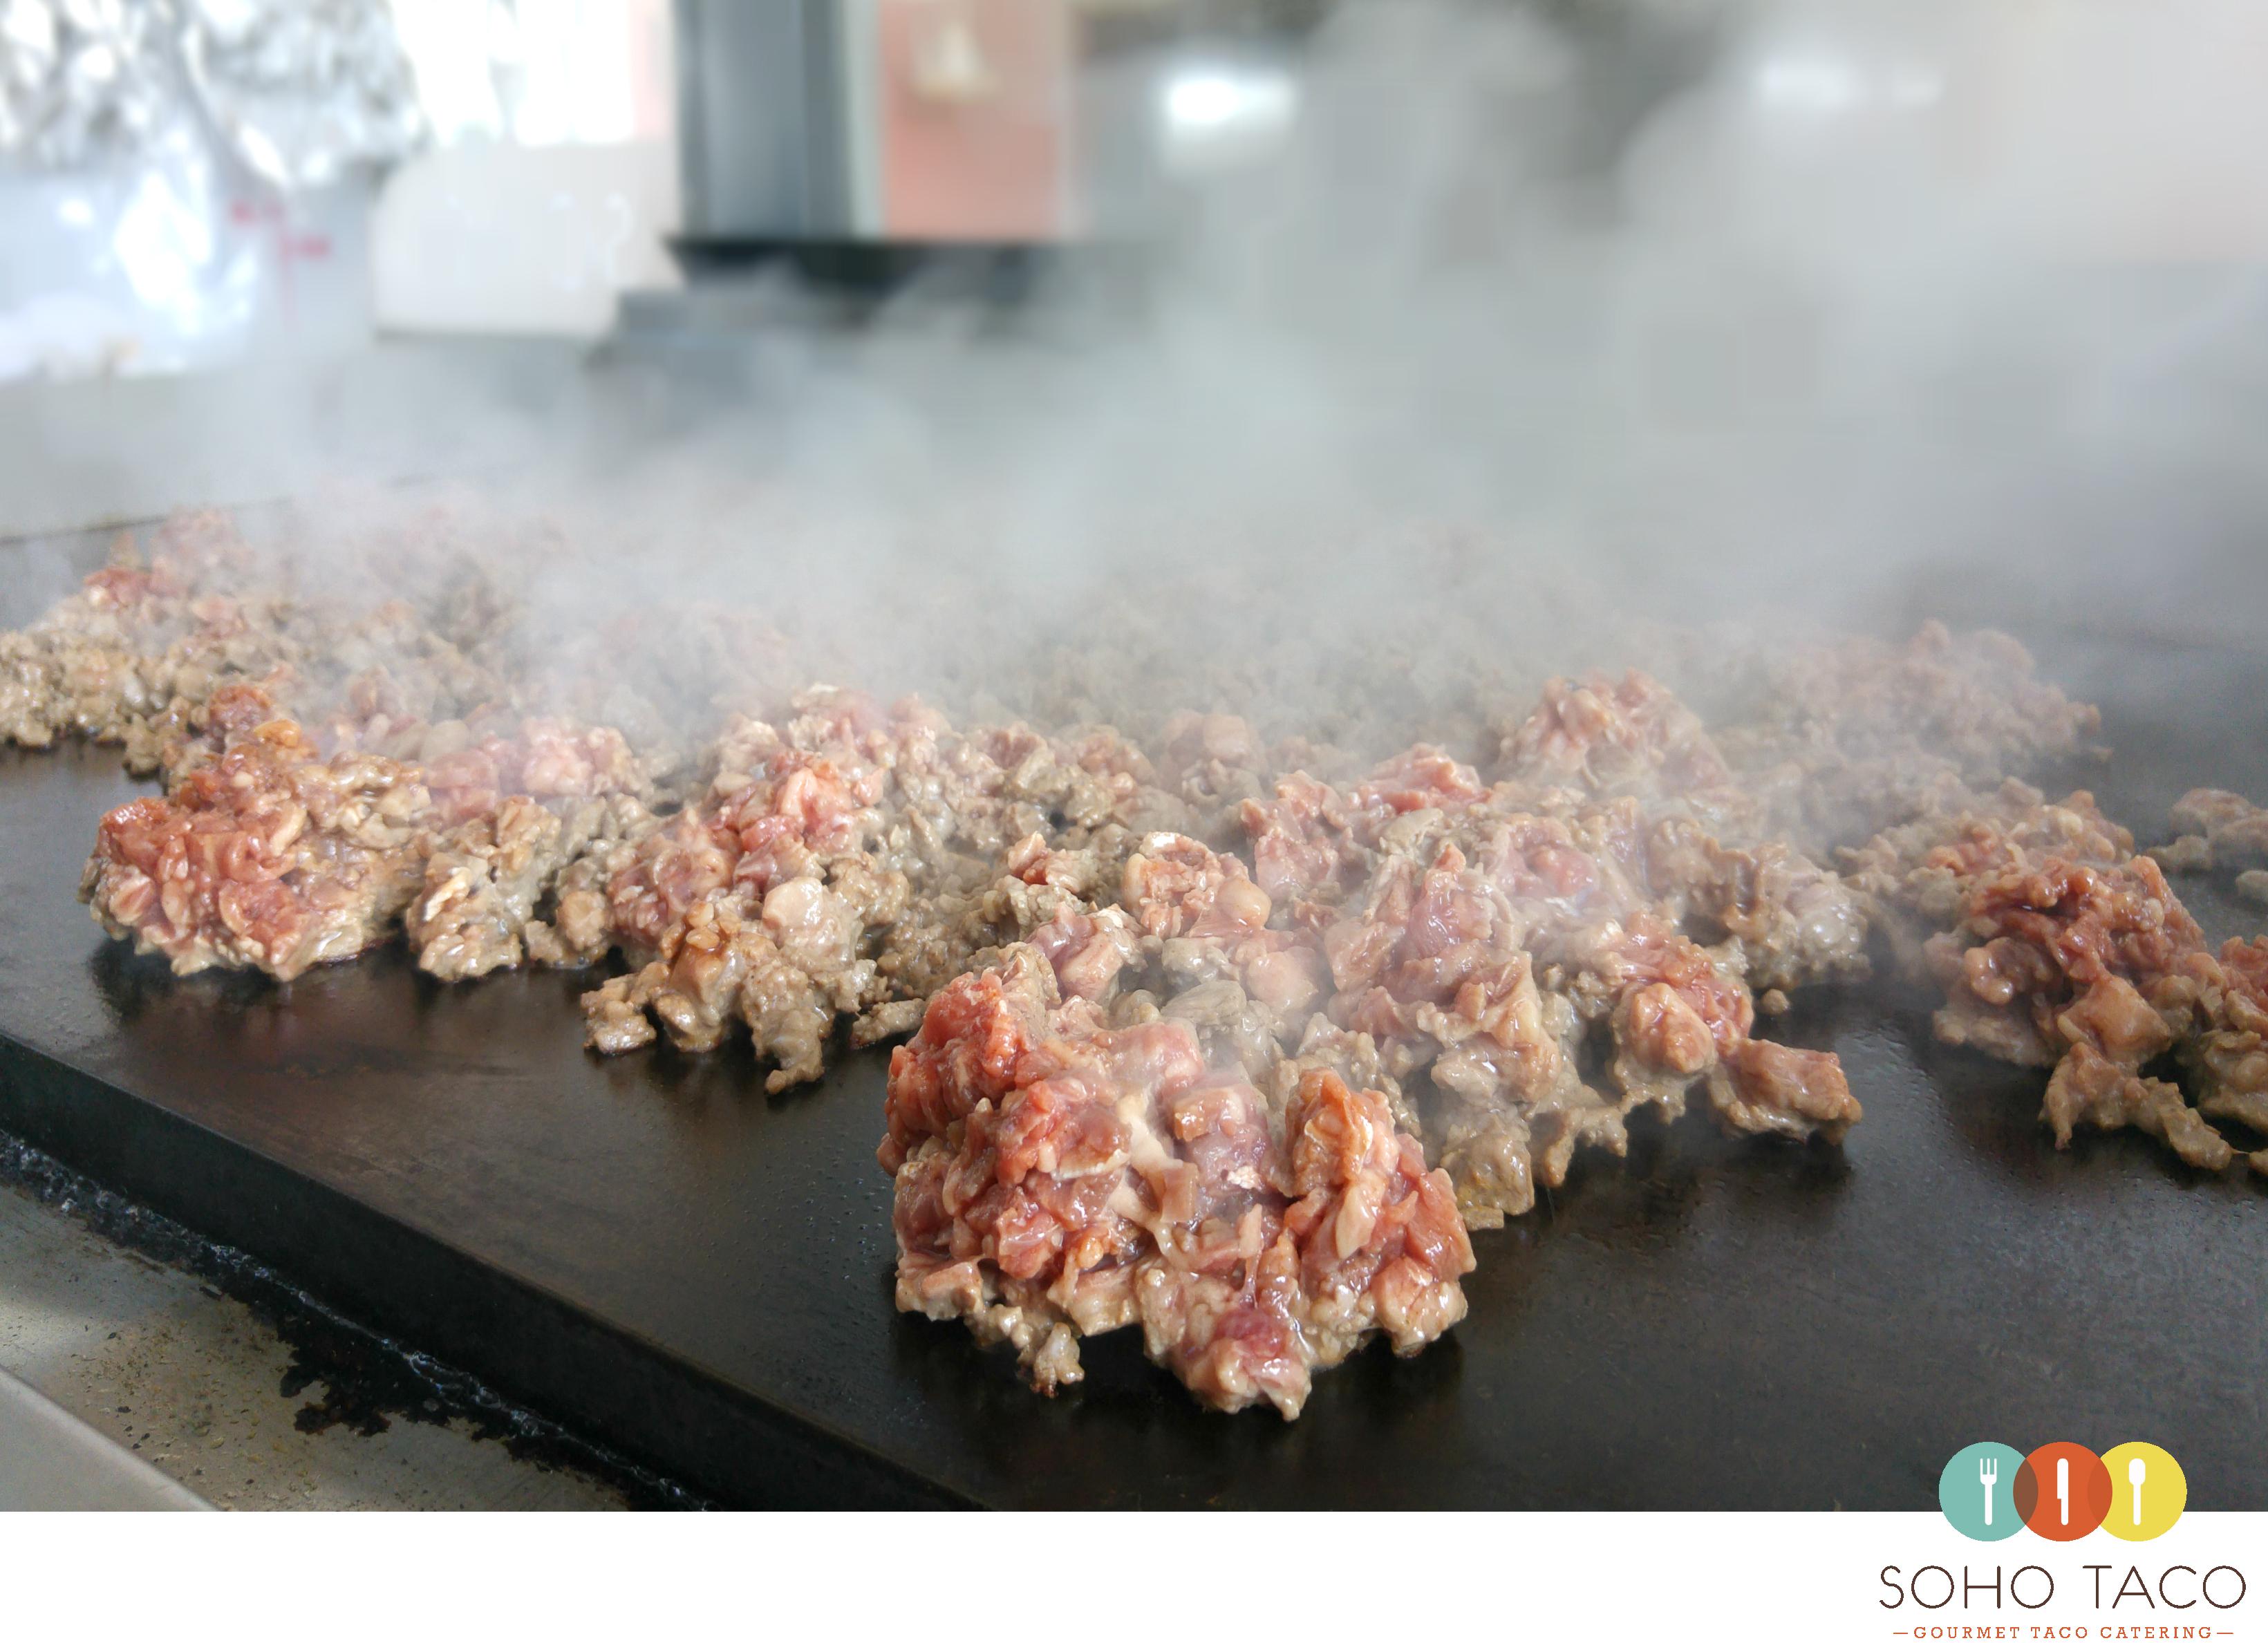 SOHO TACO Gourmet Taco Catering - Earl Warren Showgrounds - Santa Barbara - Carne Asada